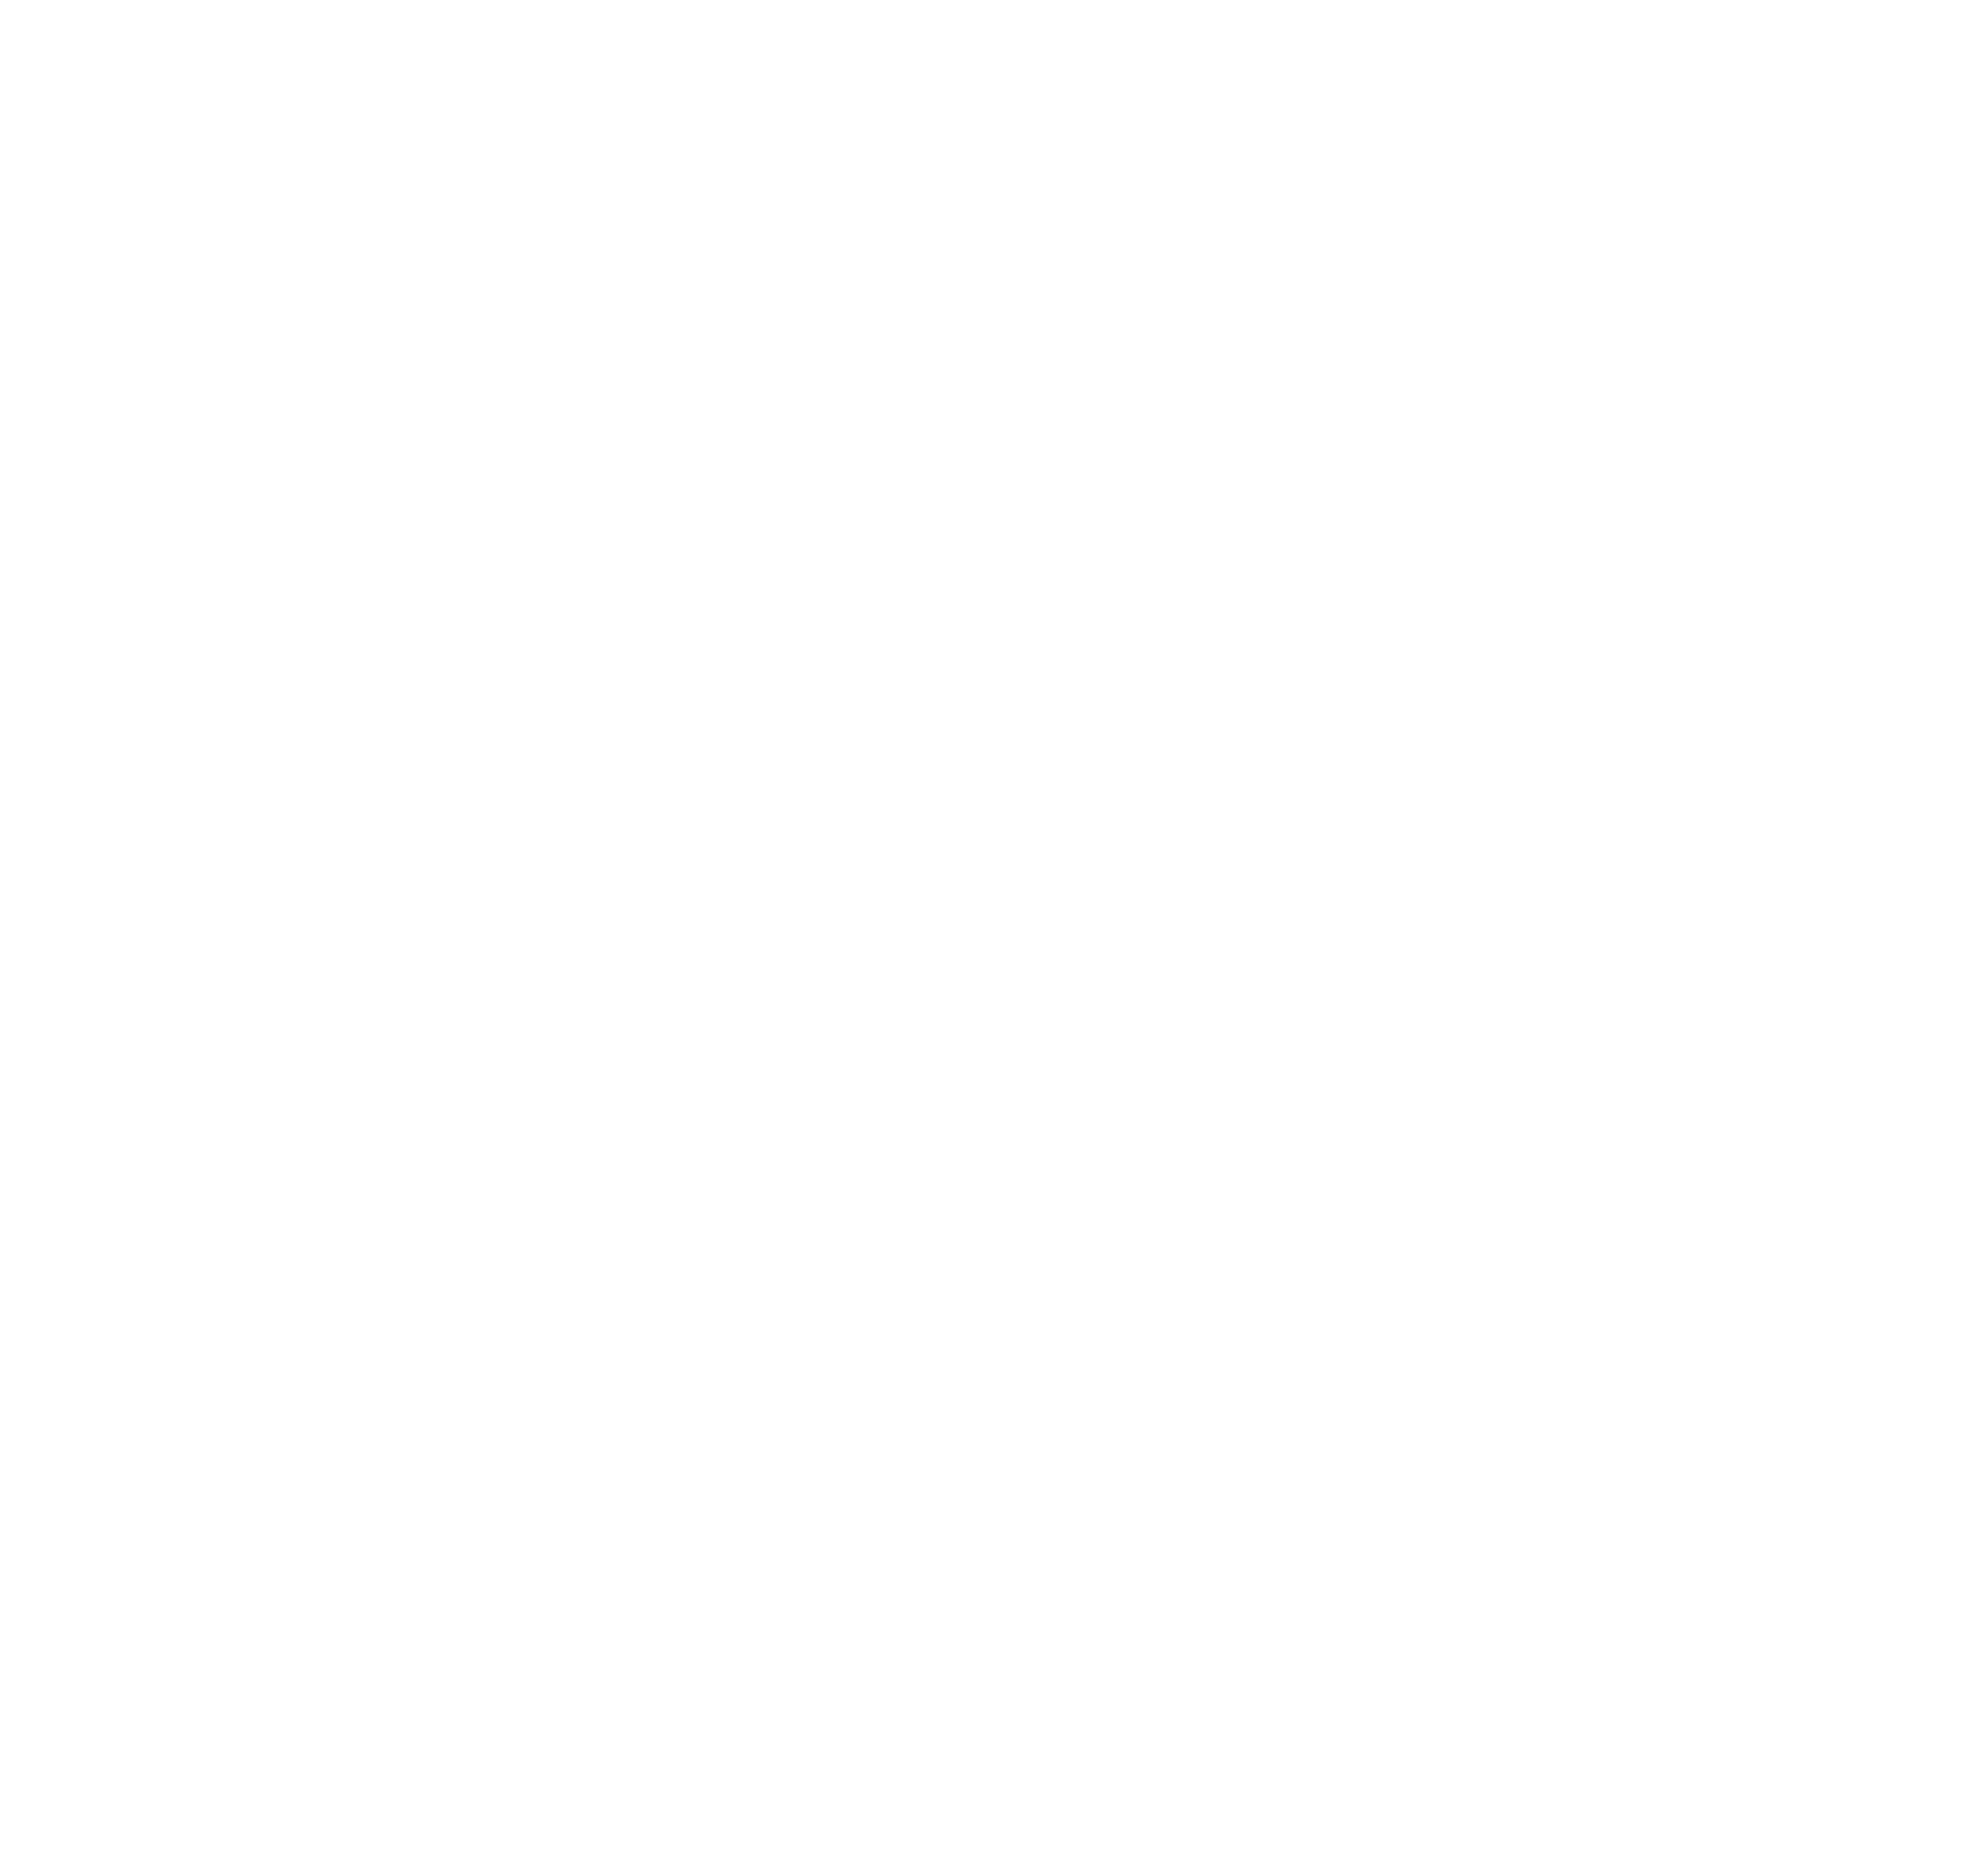 Klemets Zackrisson Reklambyrå